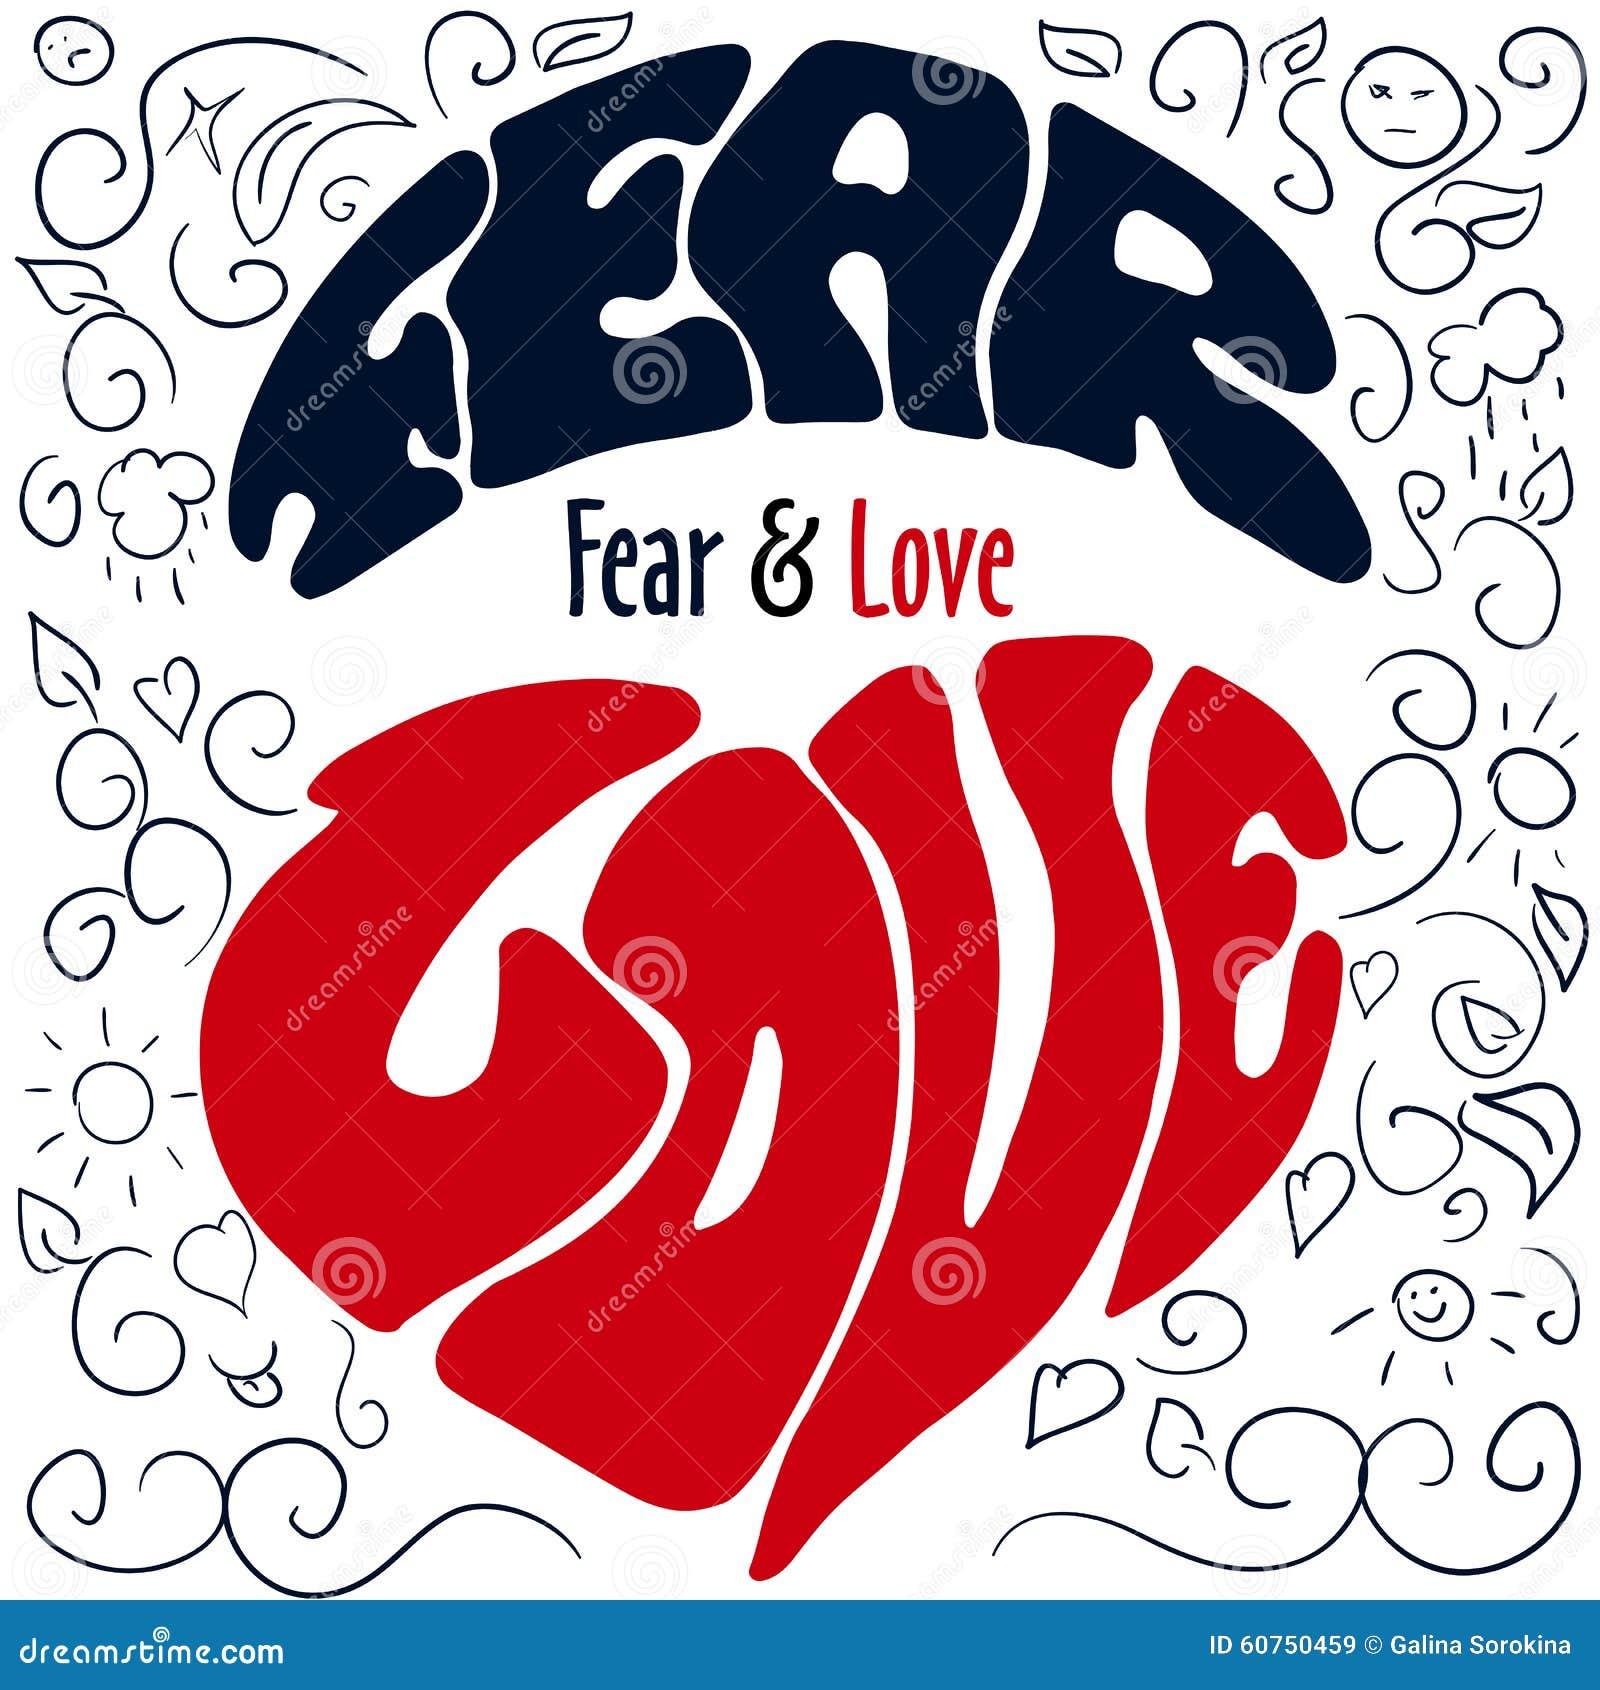 Hand getrokken emoties die vrees en liefde van letters voorzien